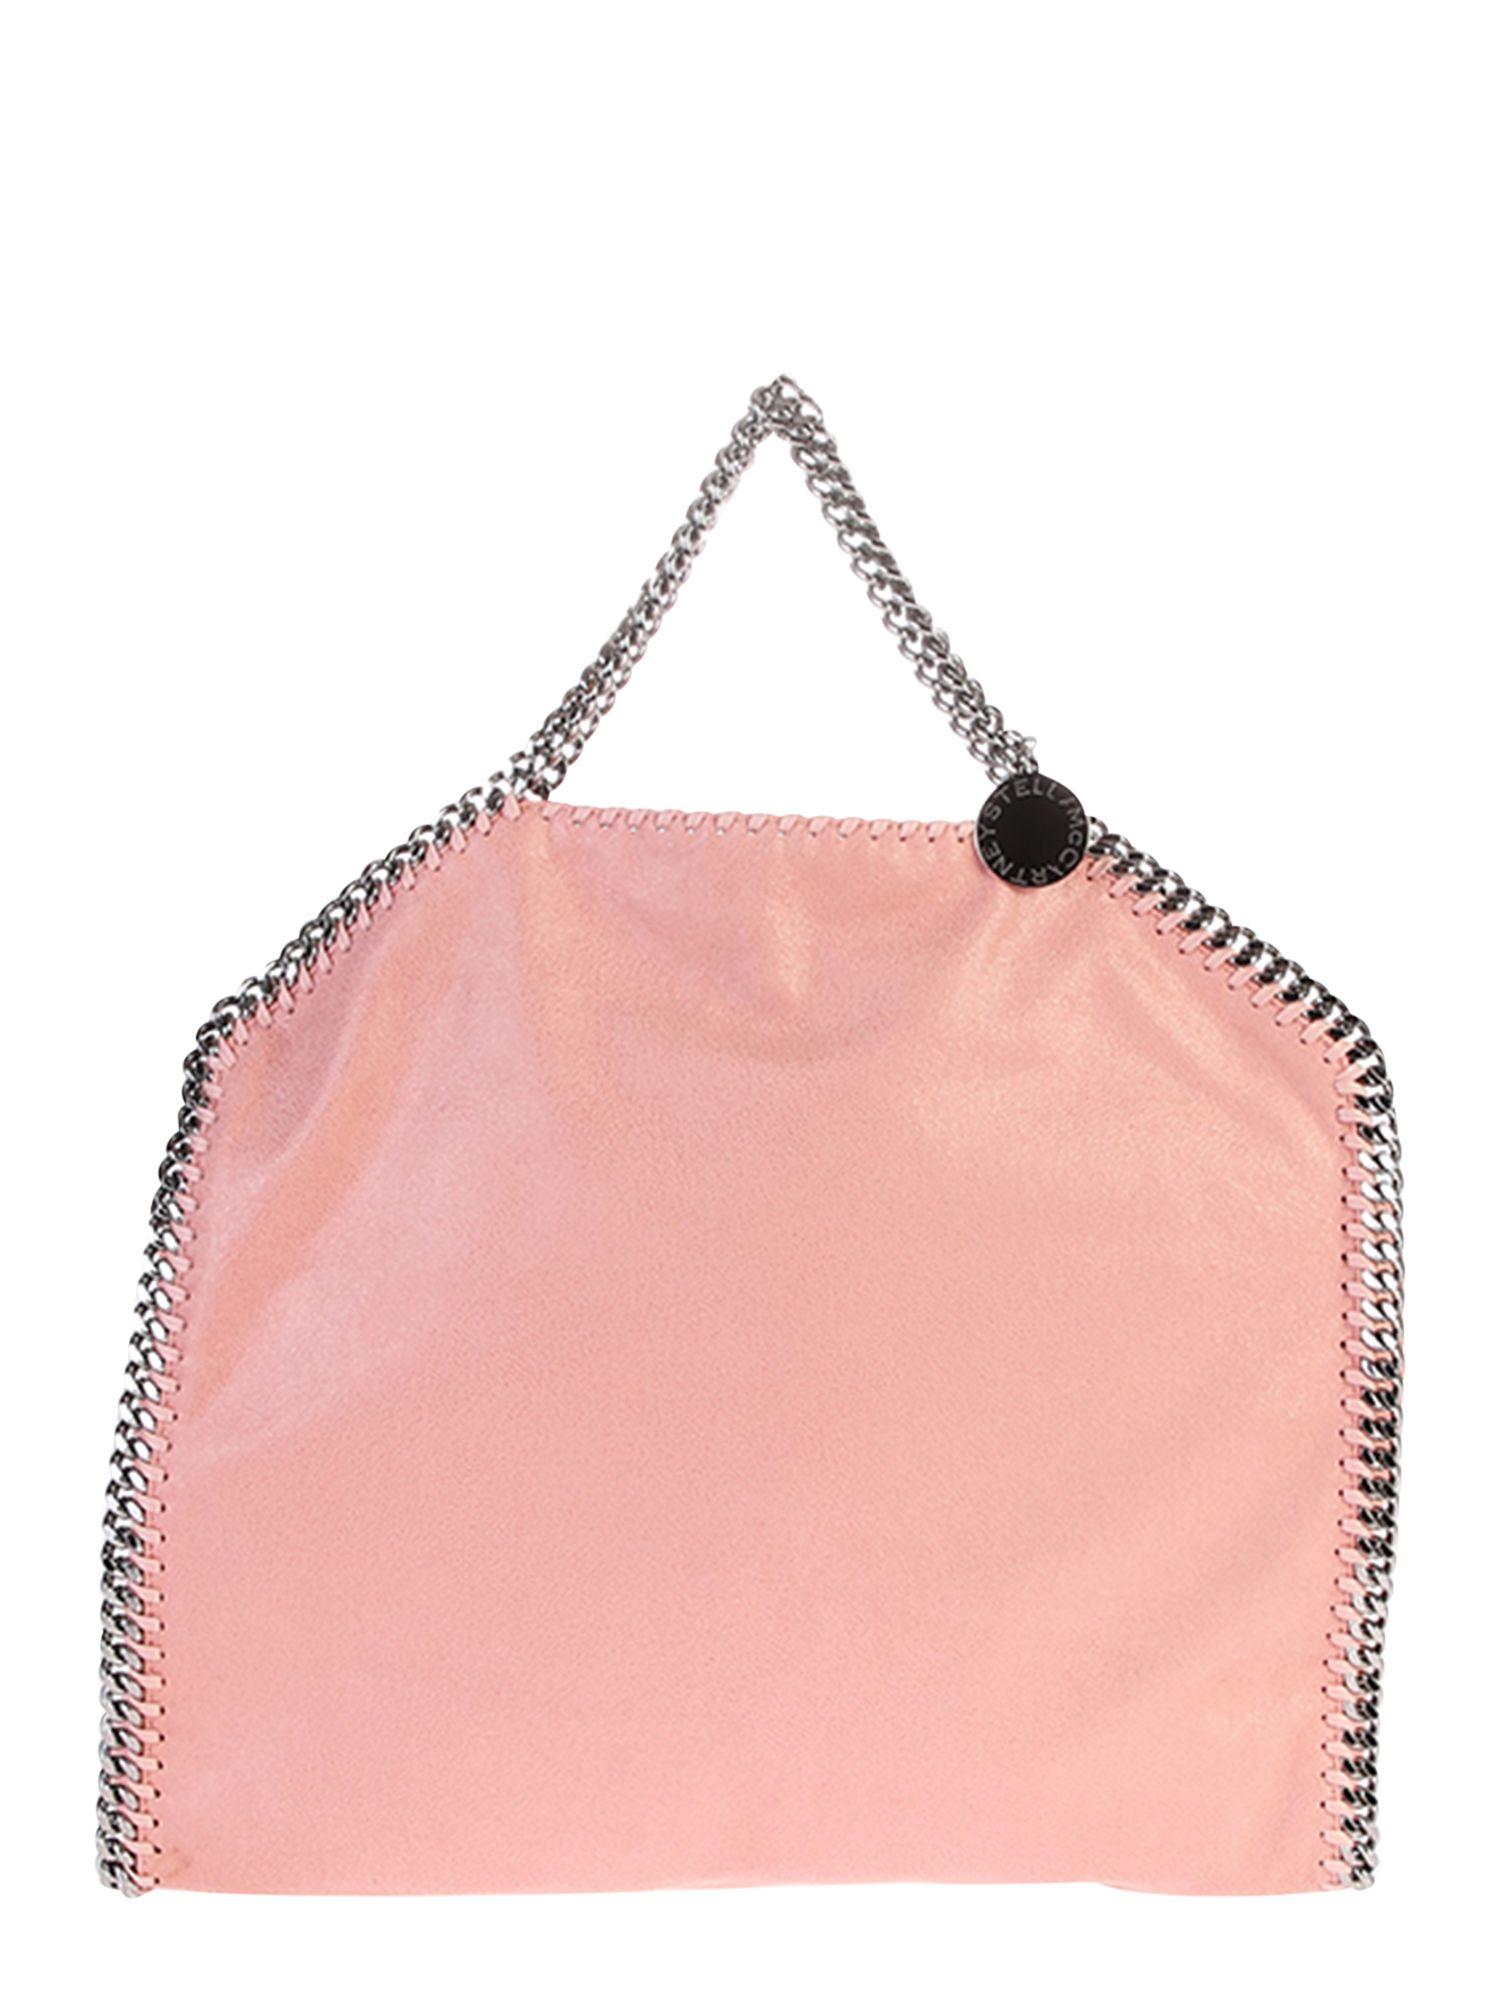 Stella McCartney Stella McCartney Falabella Triple Chain Bag - Pink ... d4b6cc190f683